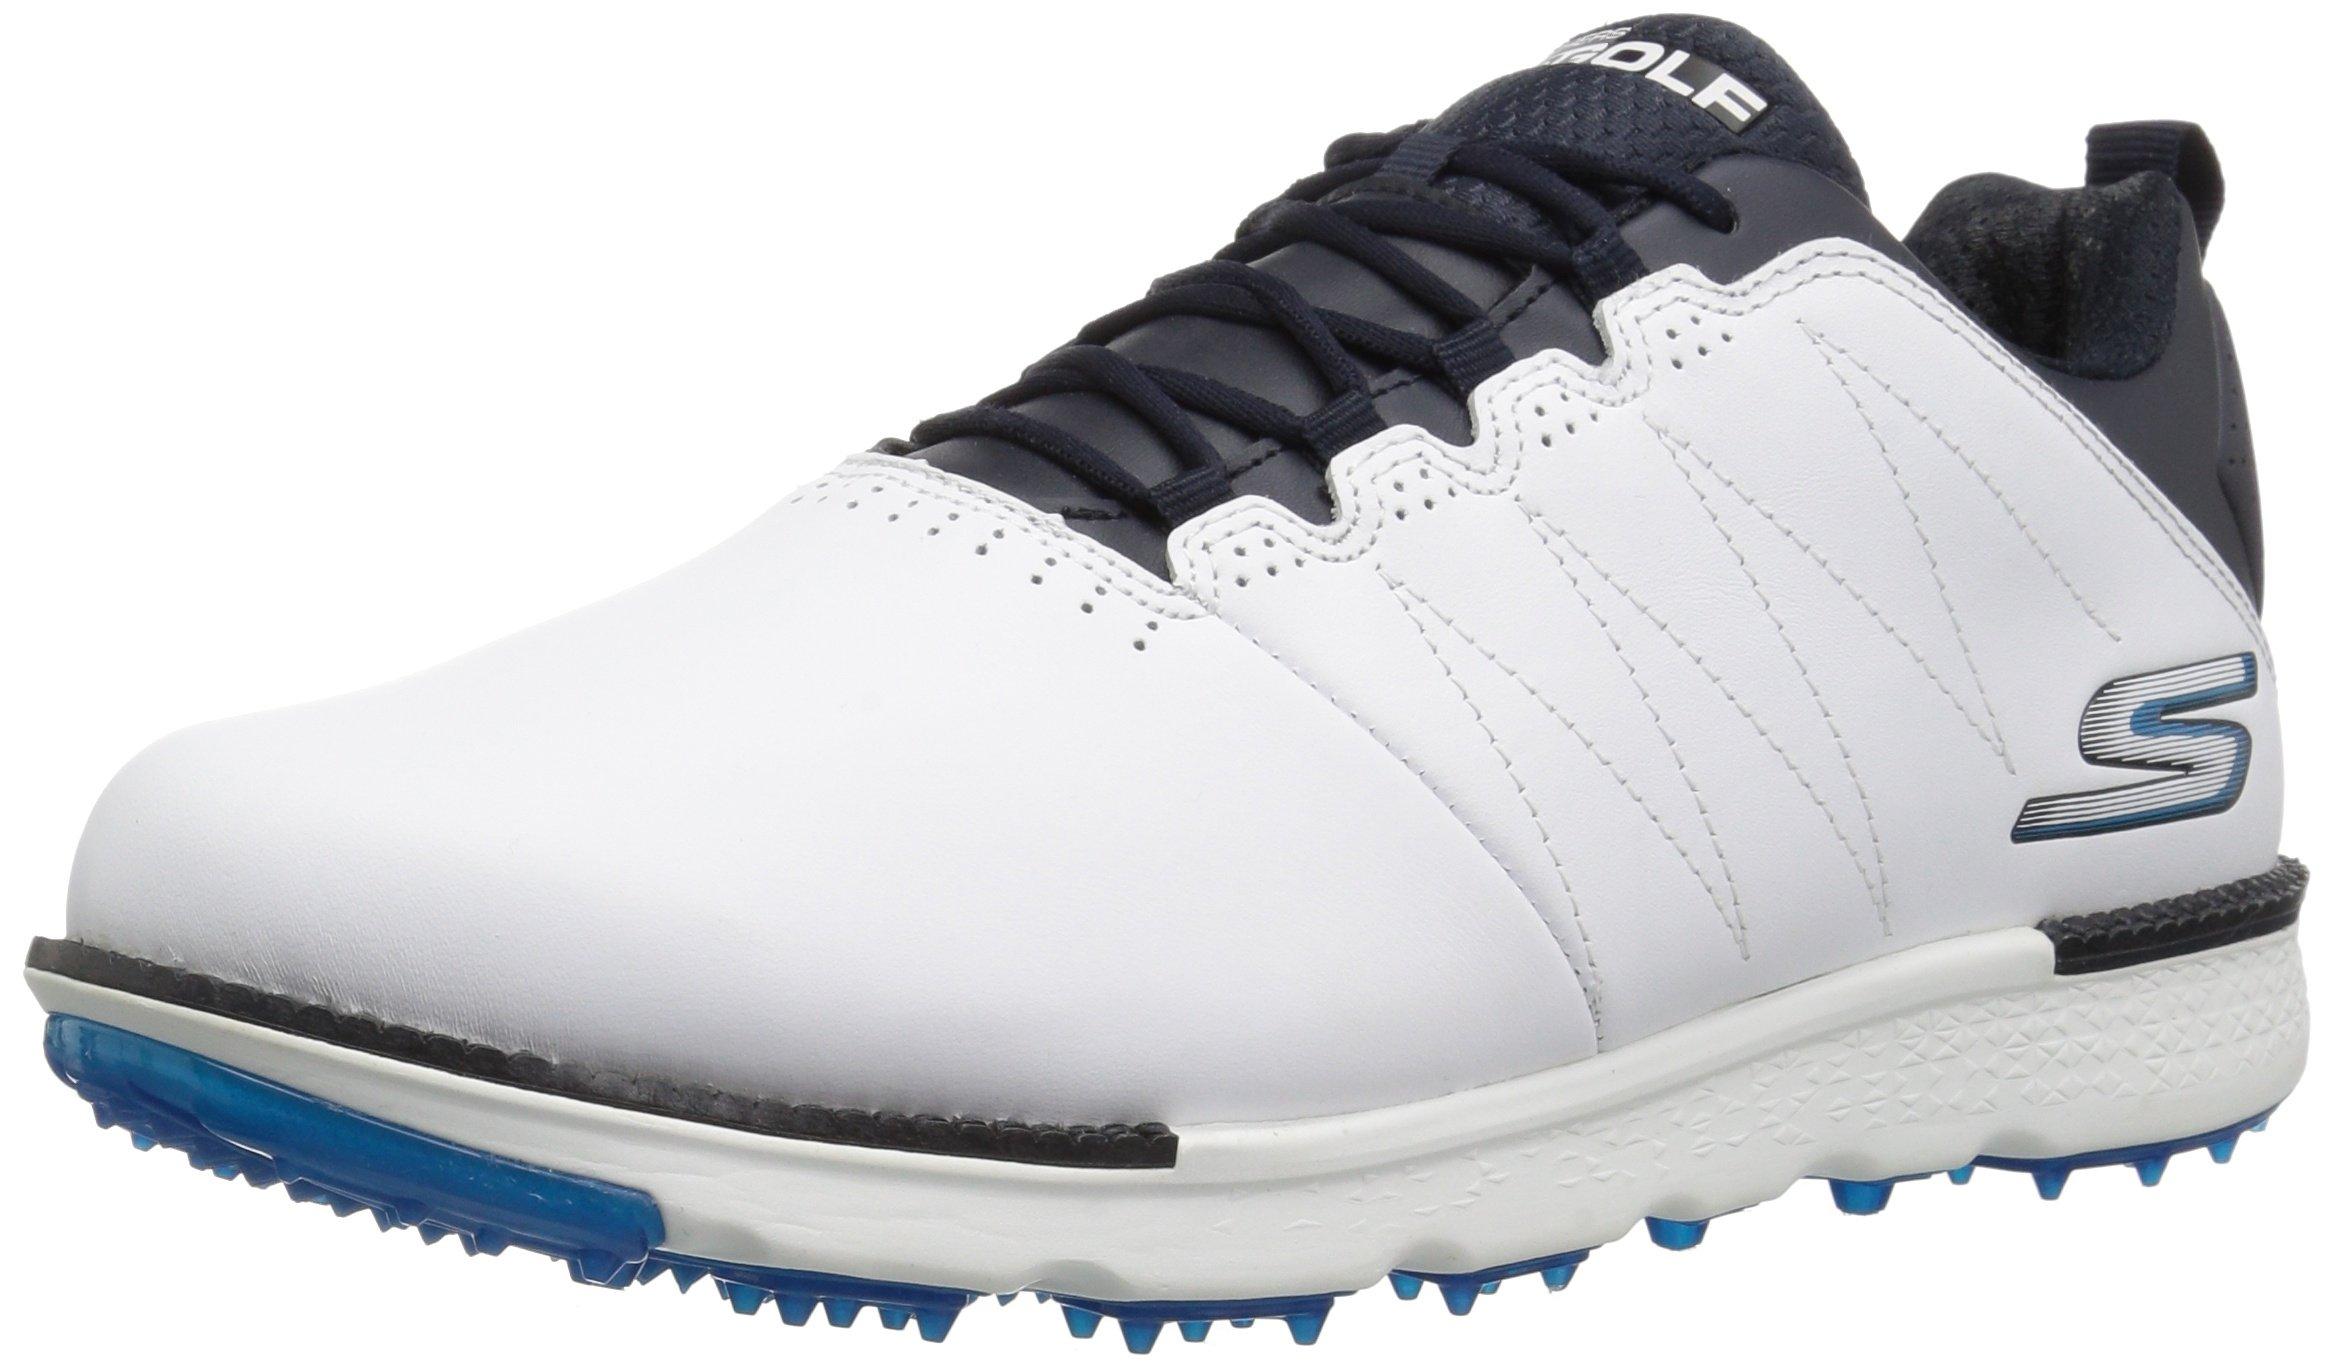 Skechers Men's Go Gole Elite 3 Wide Golf Shoe,White/Navy,9.5 W US